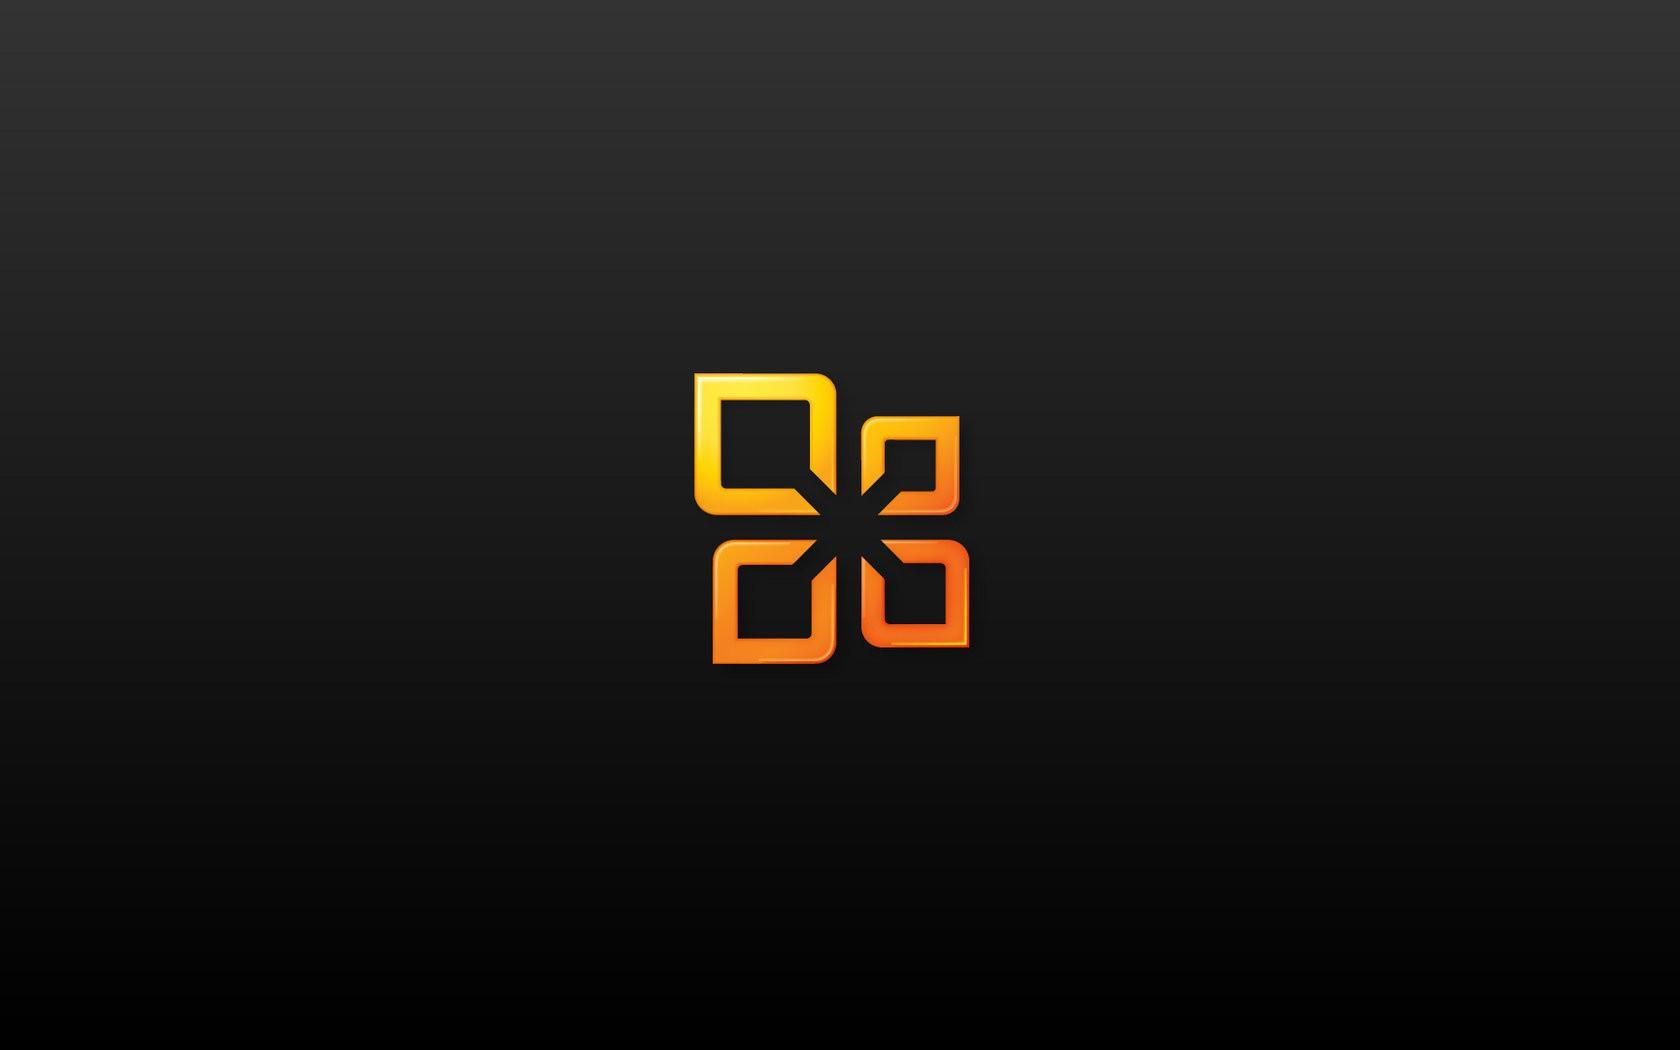 Logo Desktop Wallpapers Microsoft Office Logo Desktop Backgrounds 1680x1050